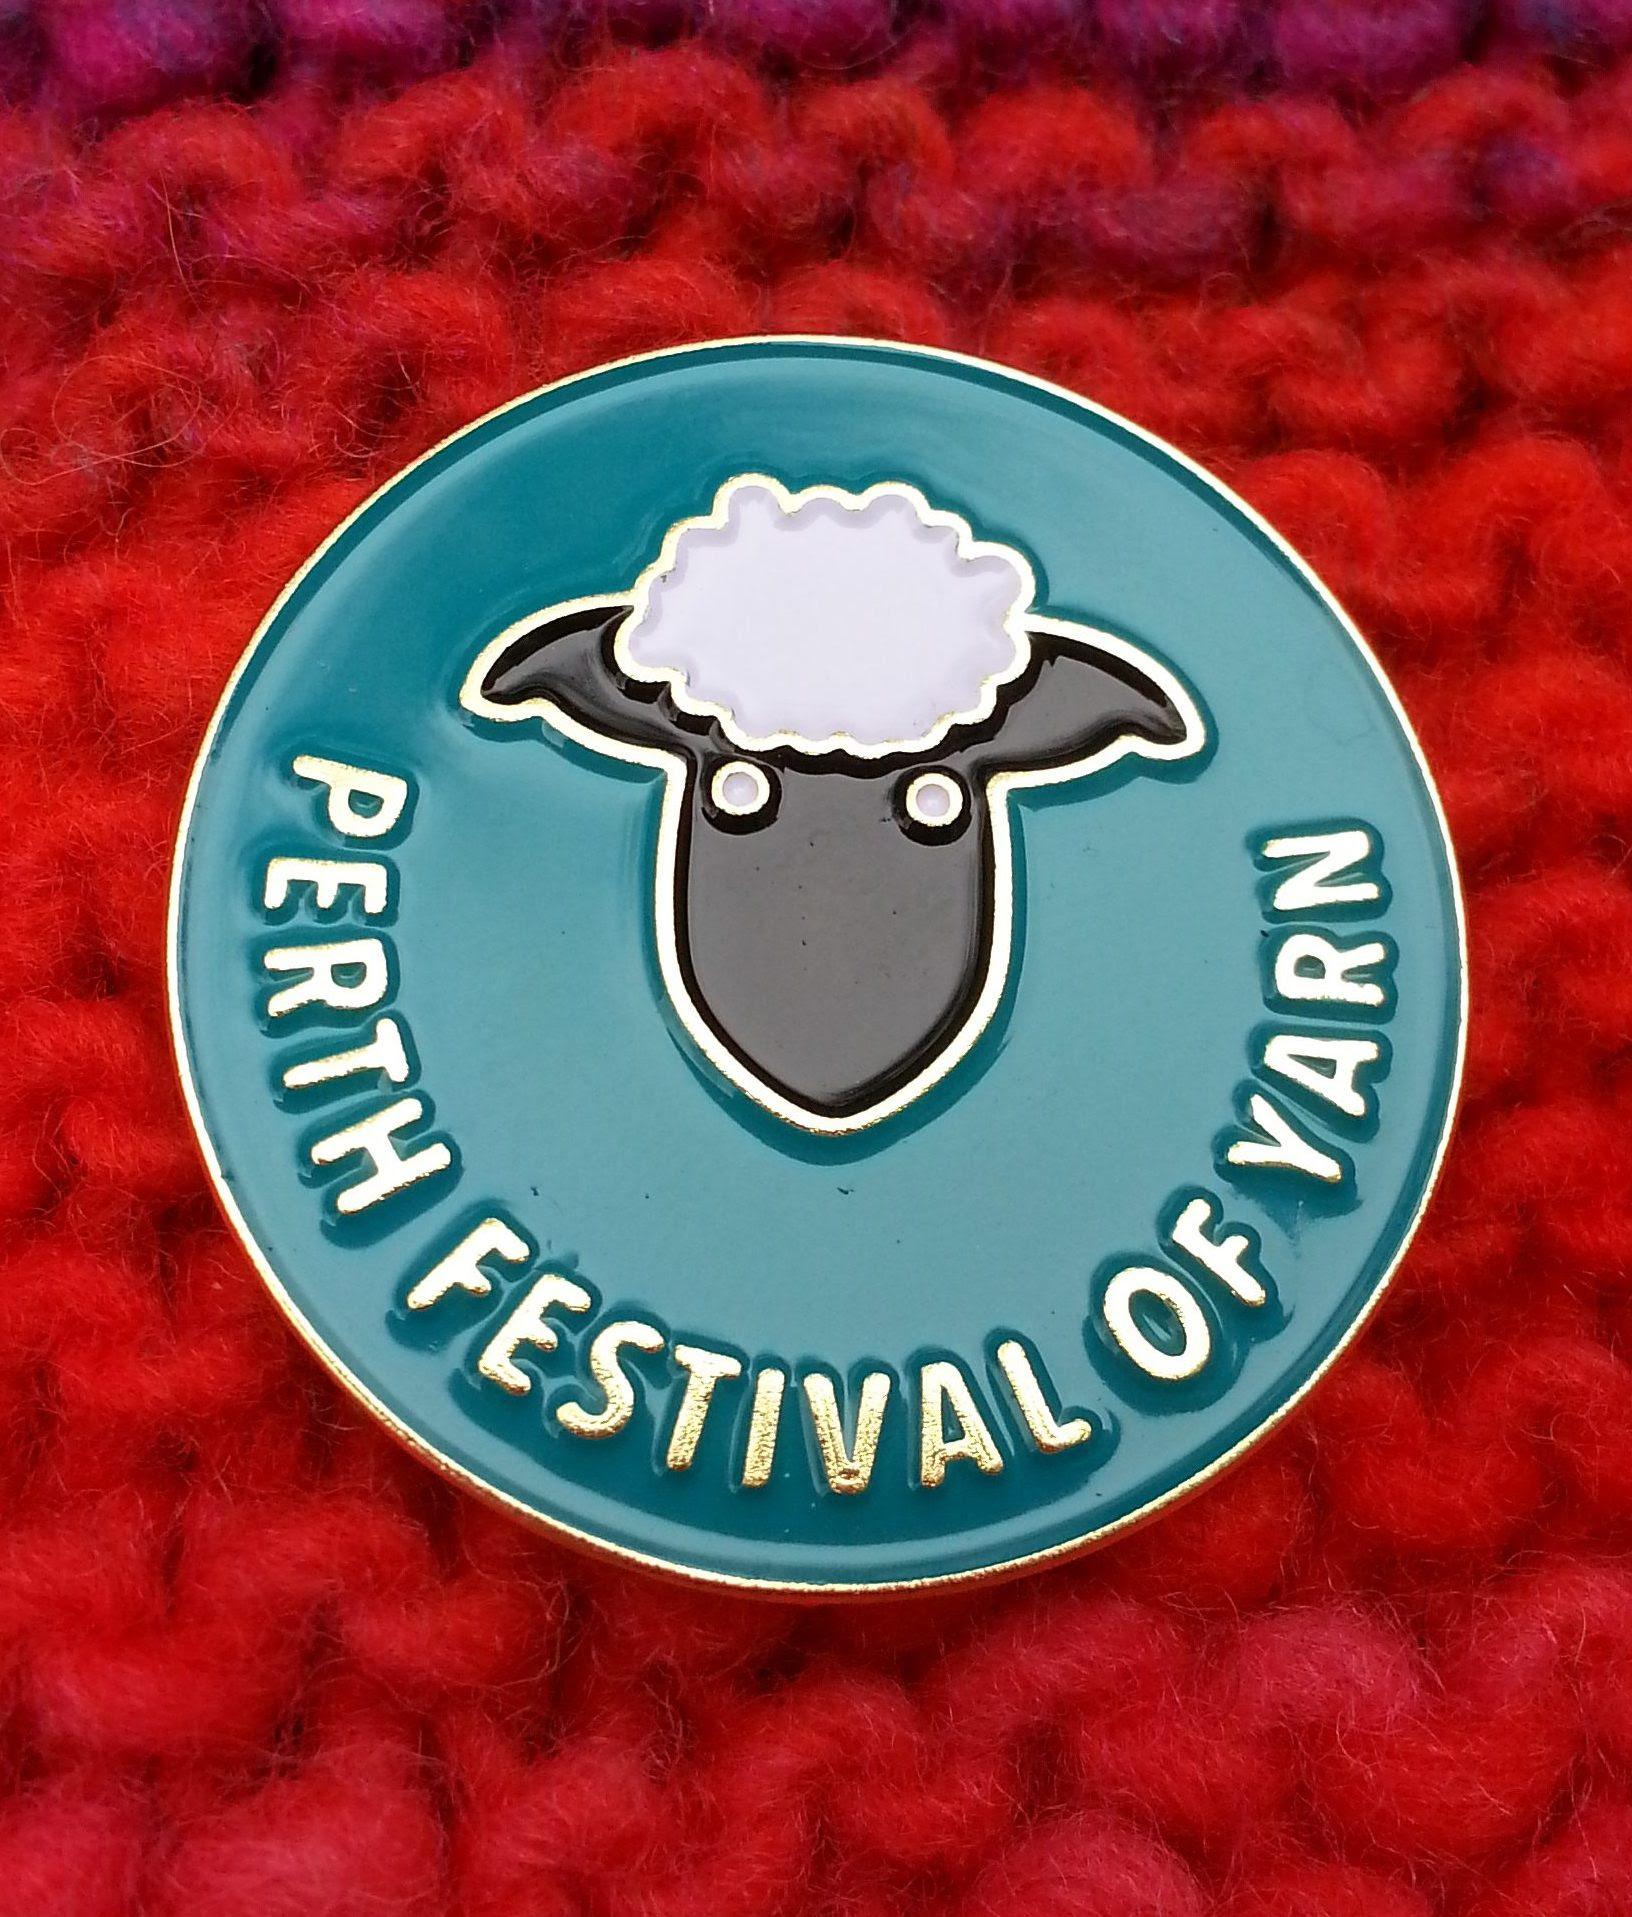 Perth Festival of Yarn 2019 merchandise – Polly Knitter